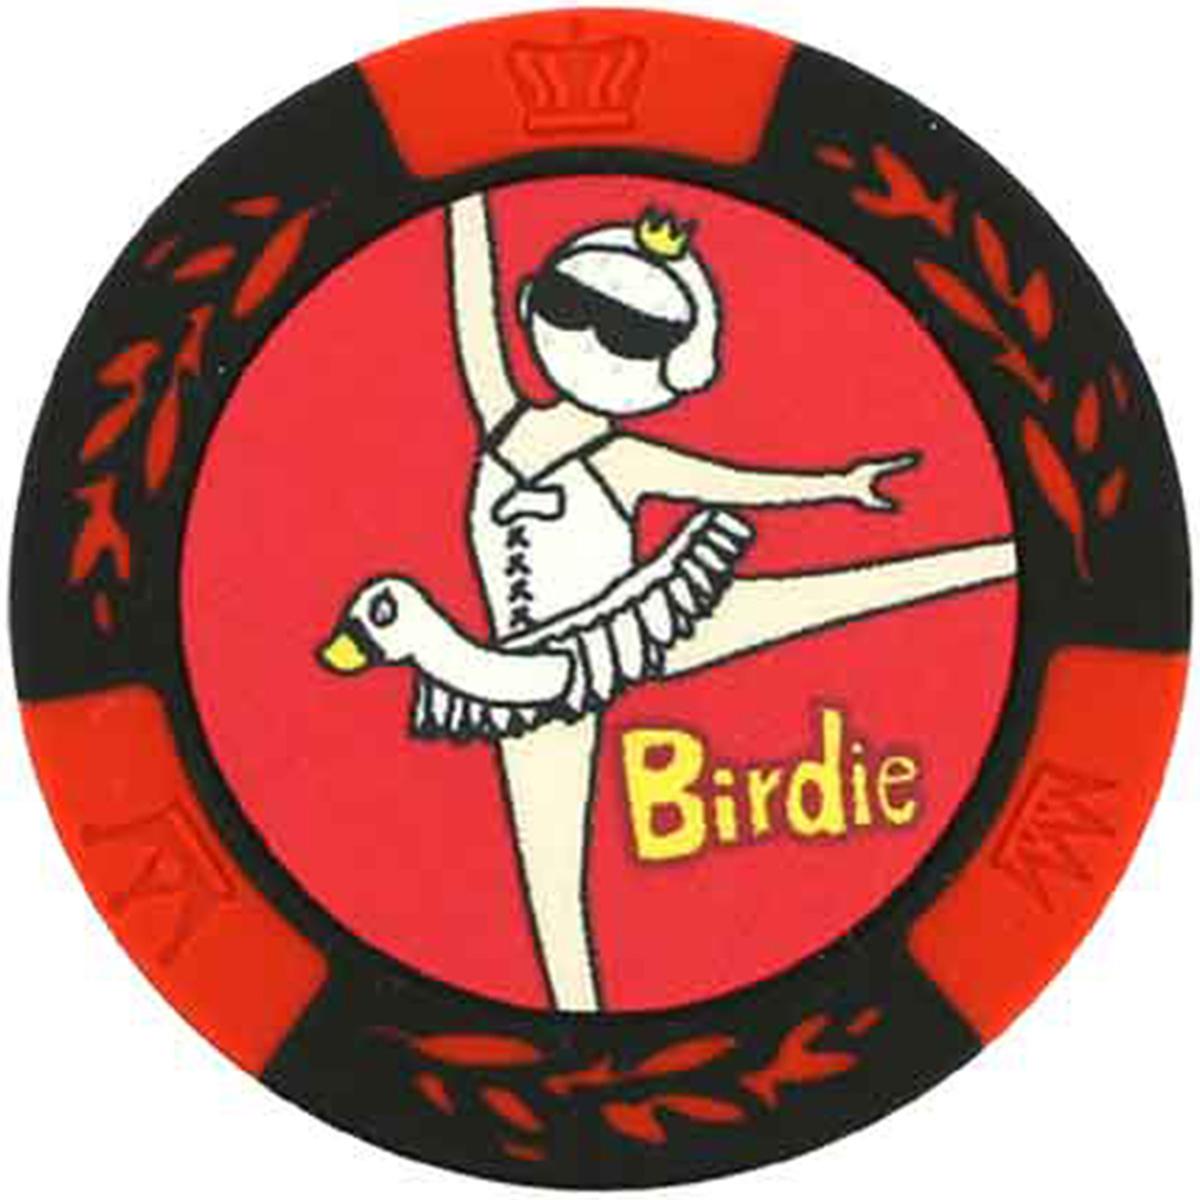 Birdie カジノチップマーカー